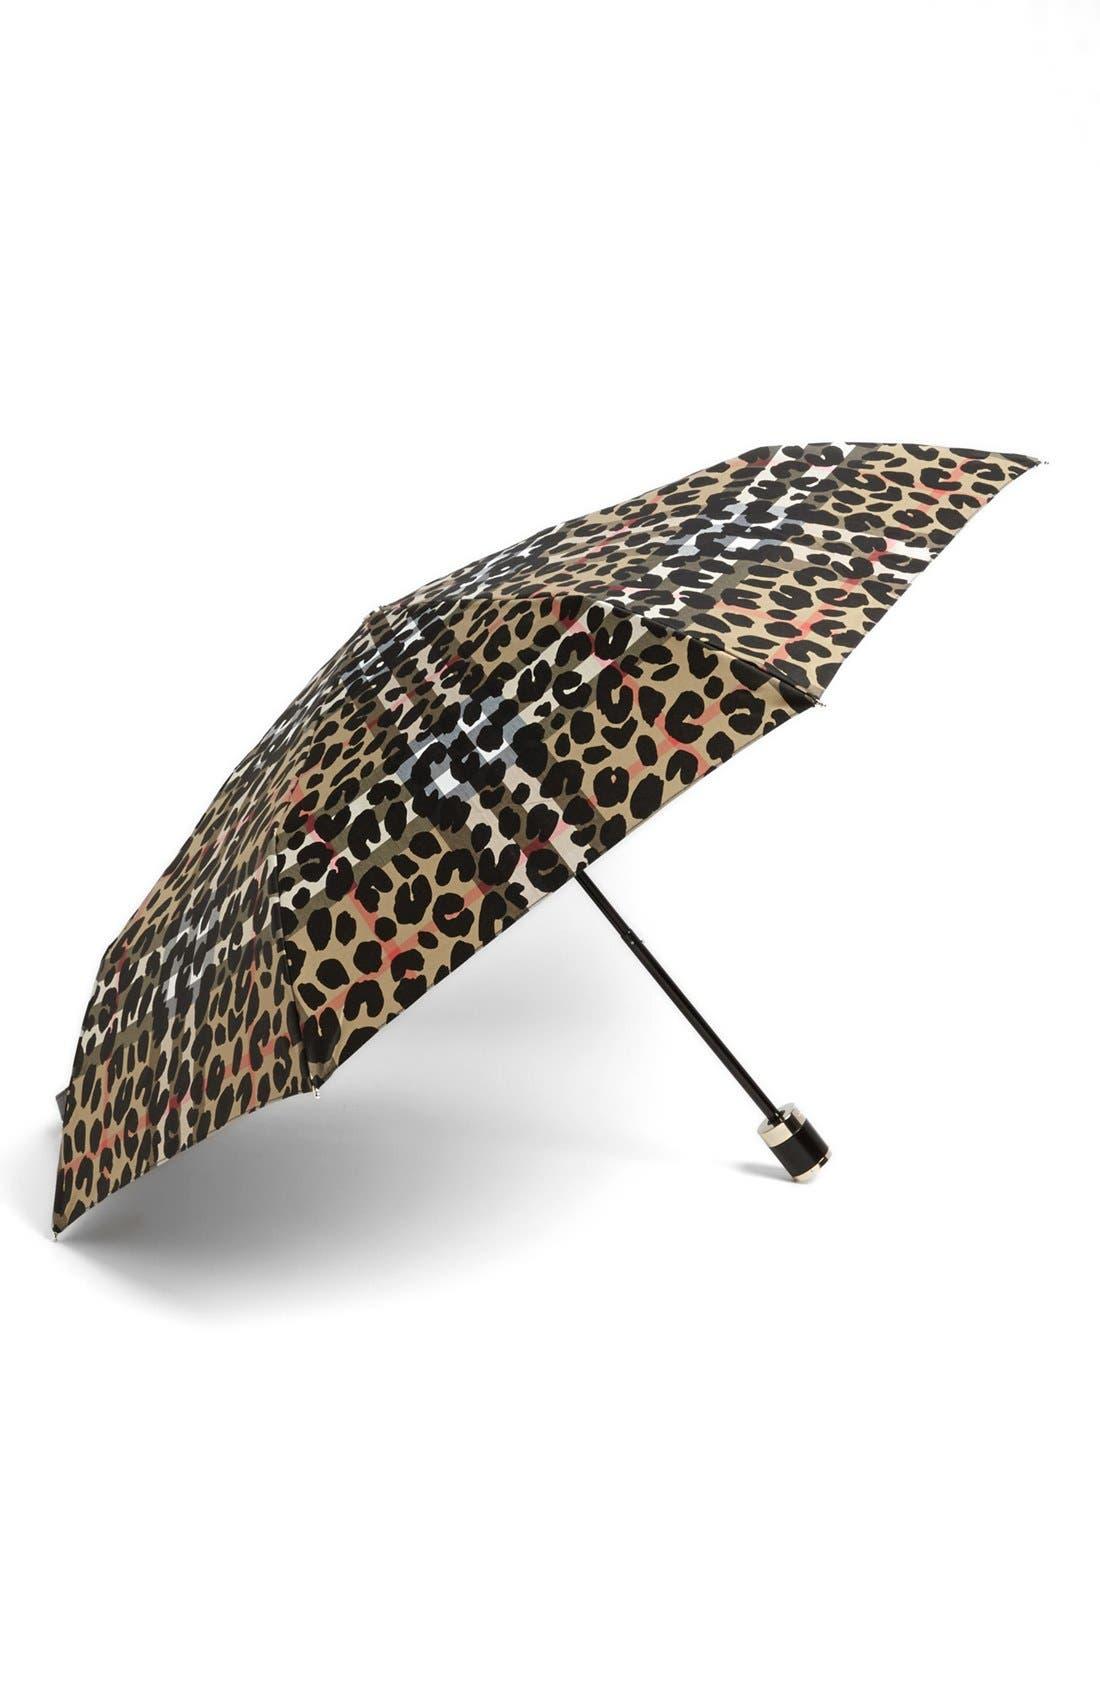 Main Image - Burberry London Compact Umbrella